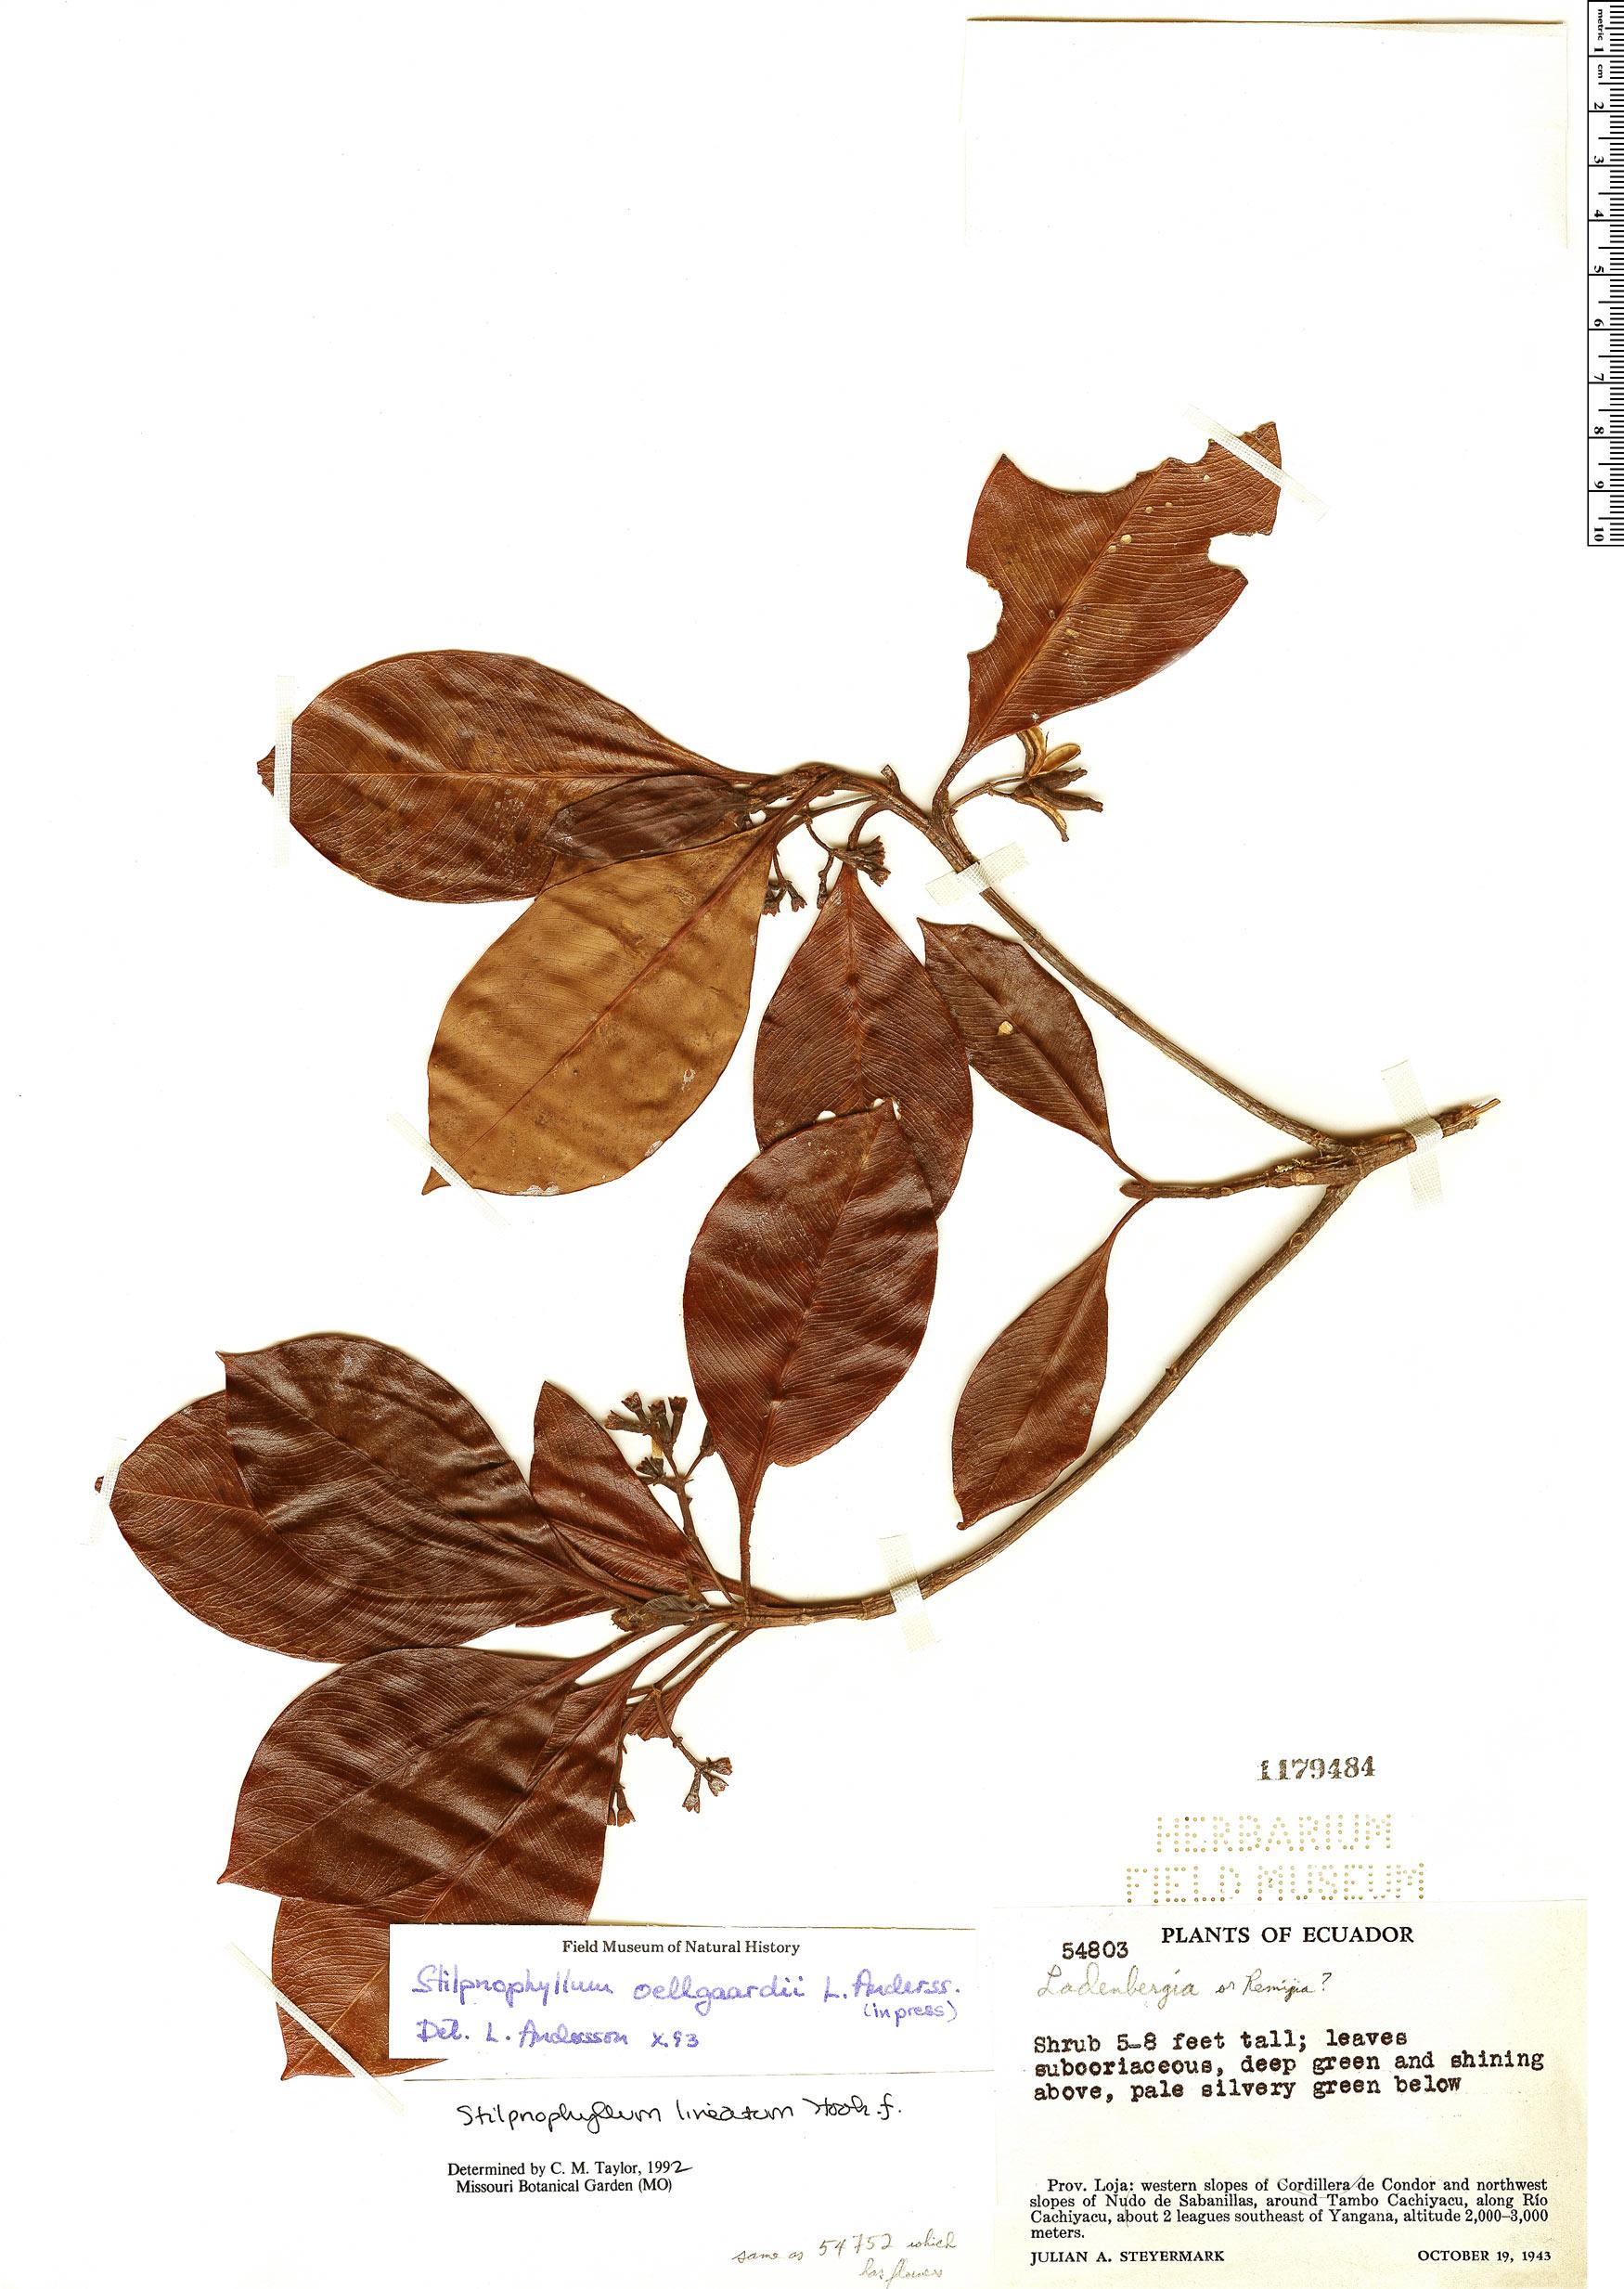 Specimen: Stilpnophyllum oellgaardii